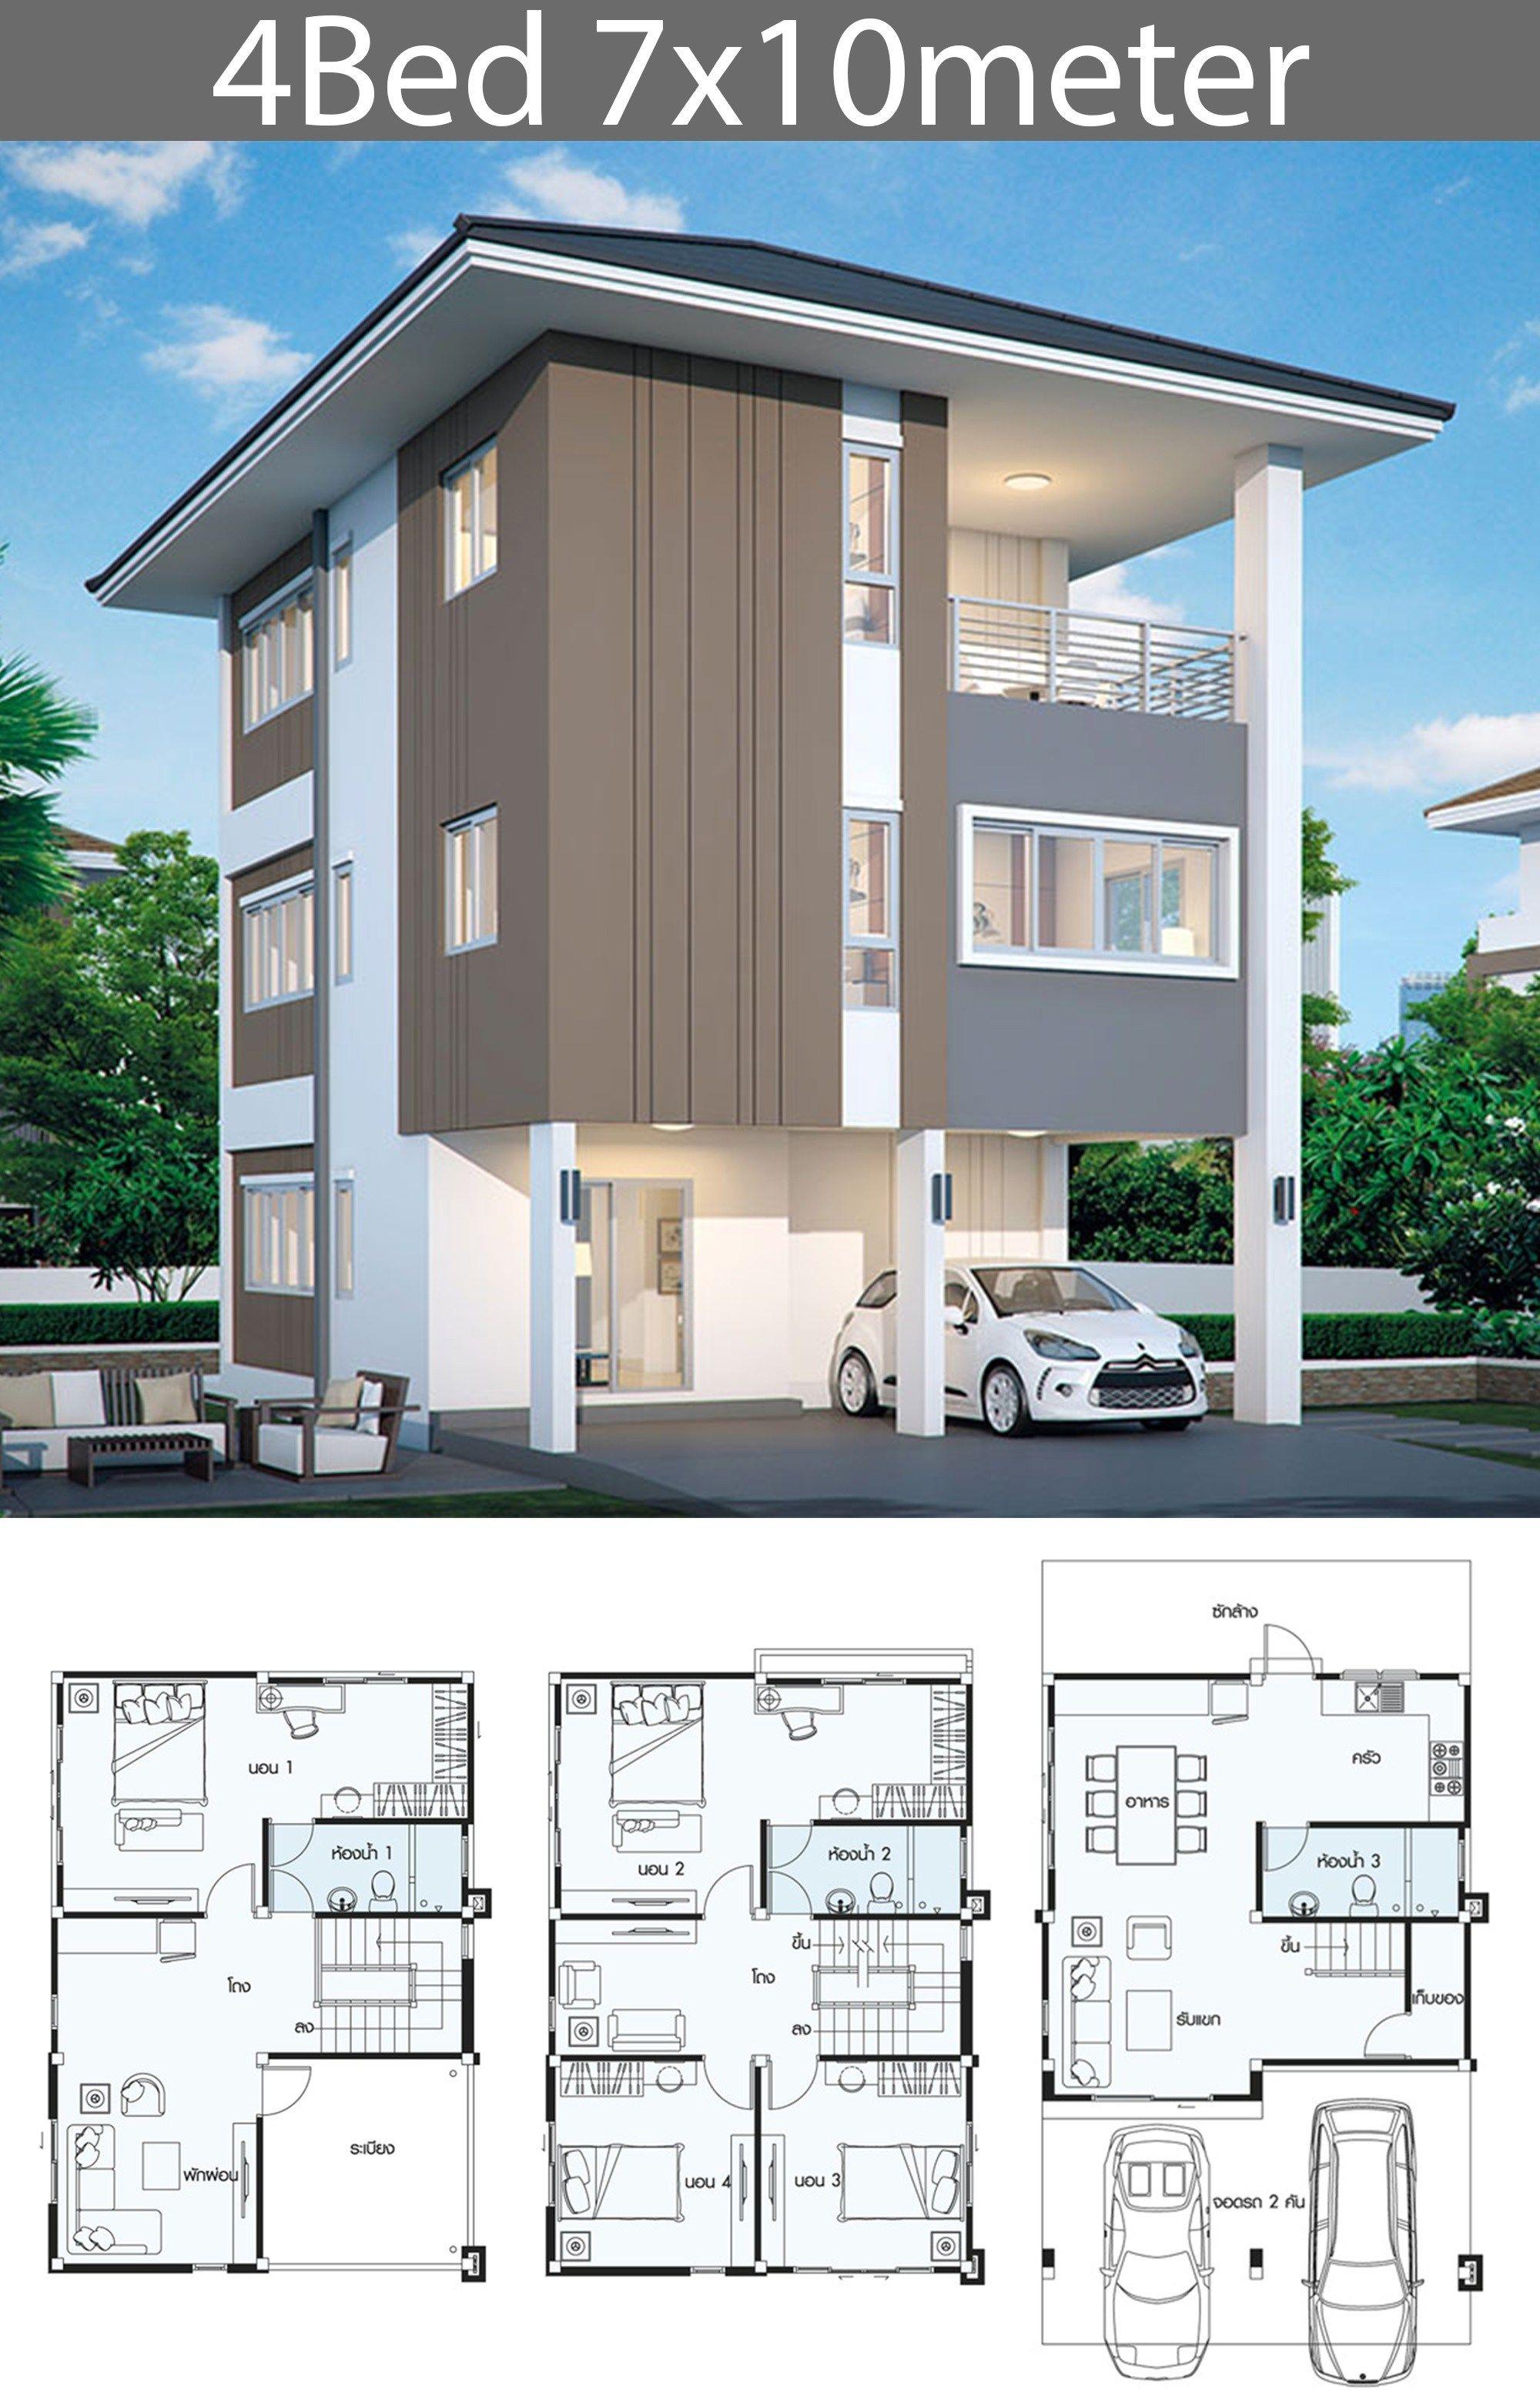 5 Ideas Home Design Plan 7x10m 1 House Design Plan 7x10 With 4 Bedrooms 2 Home Design Plan 7x10m W In 2020 House Architecture Design Home Design Plans Model House Plan